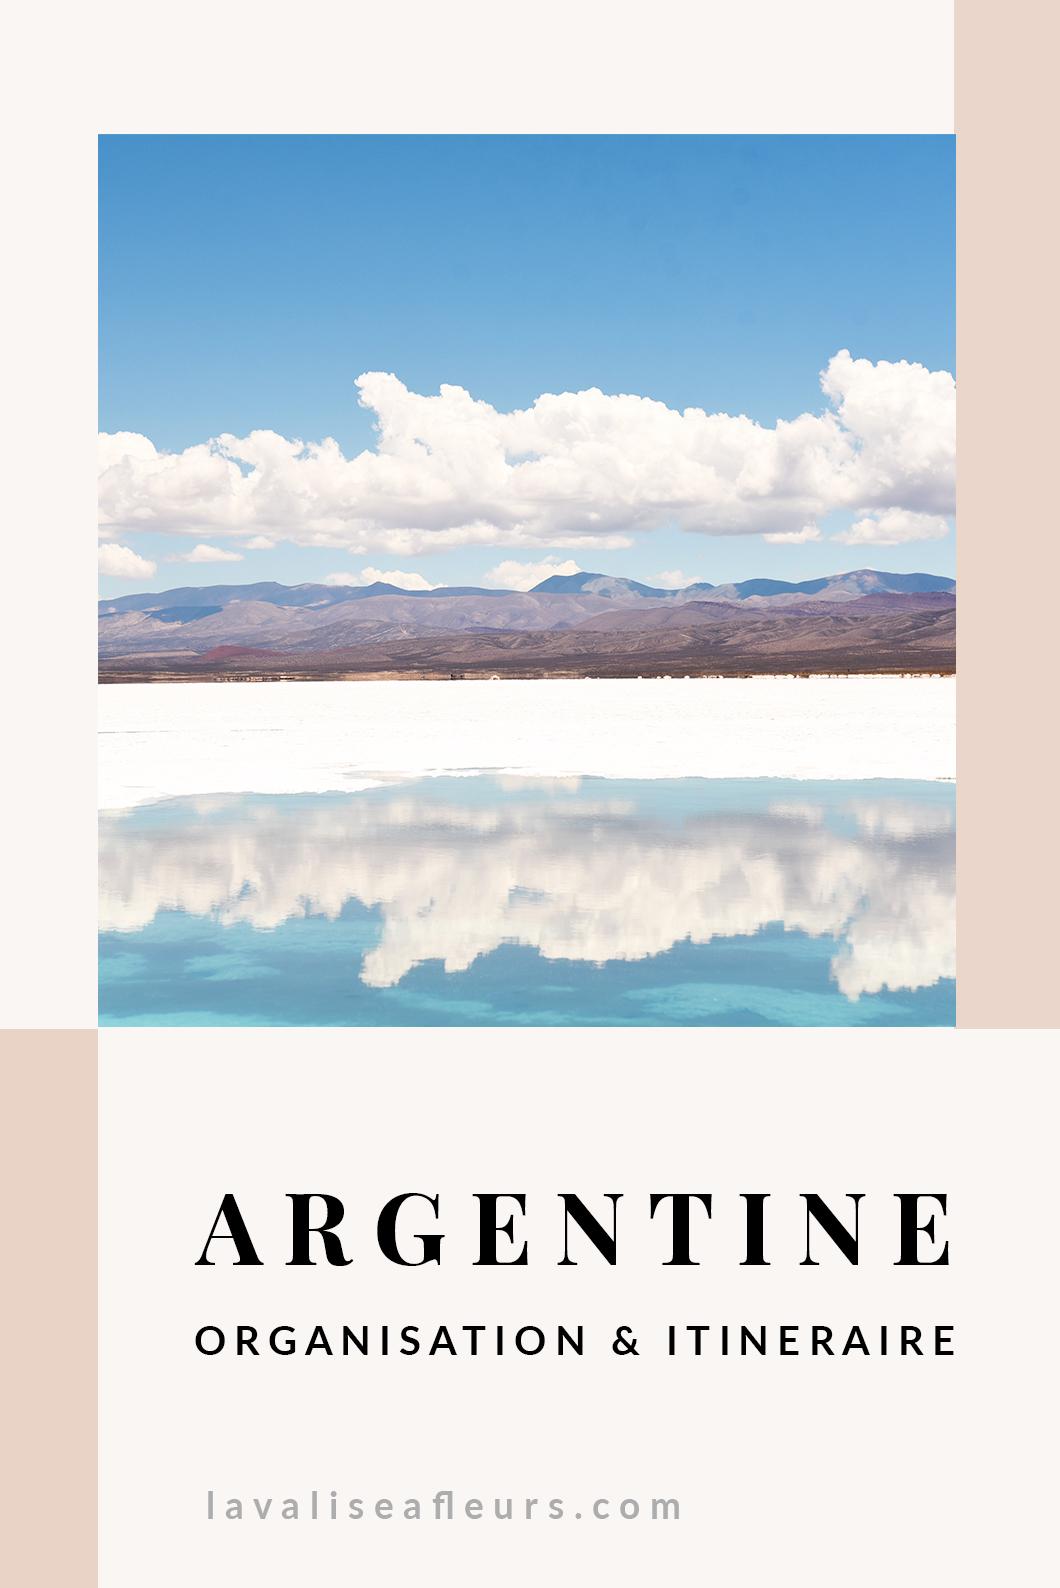 Organisation et itinéraire en Argentine